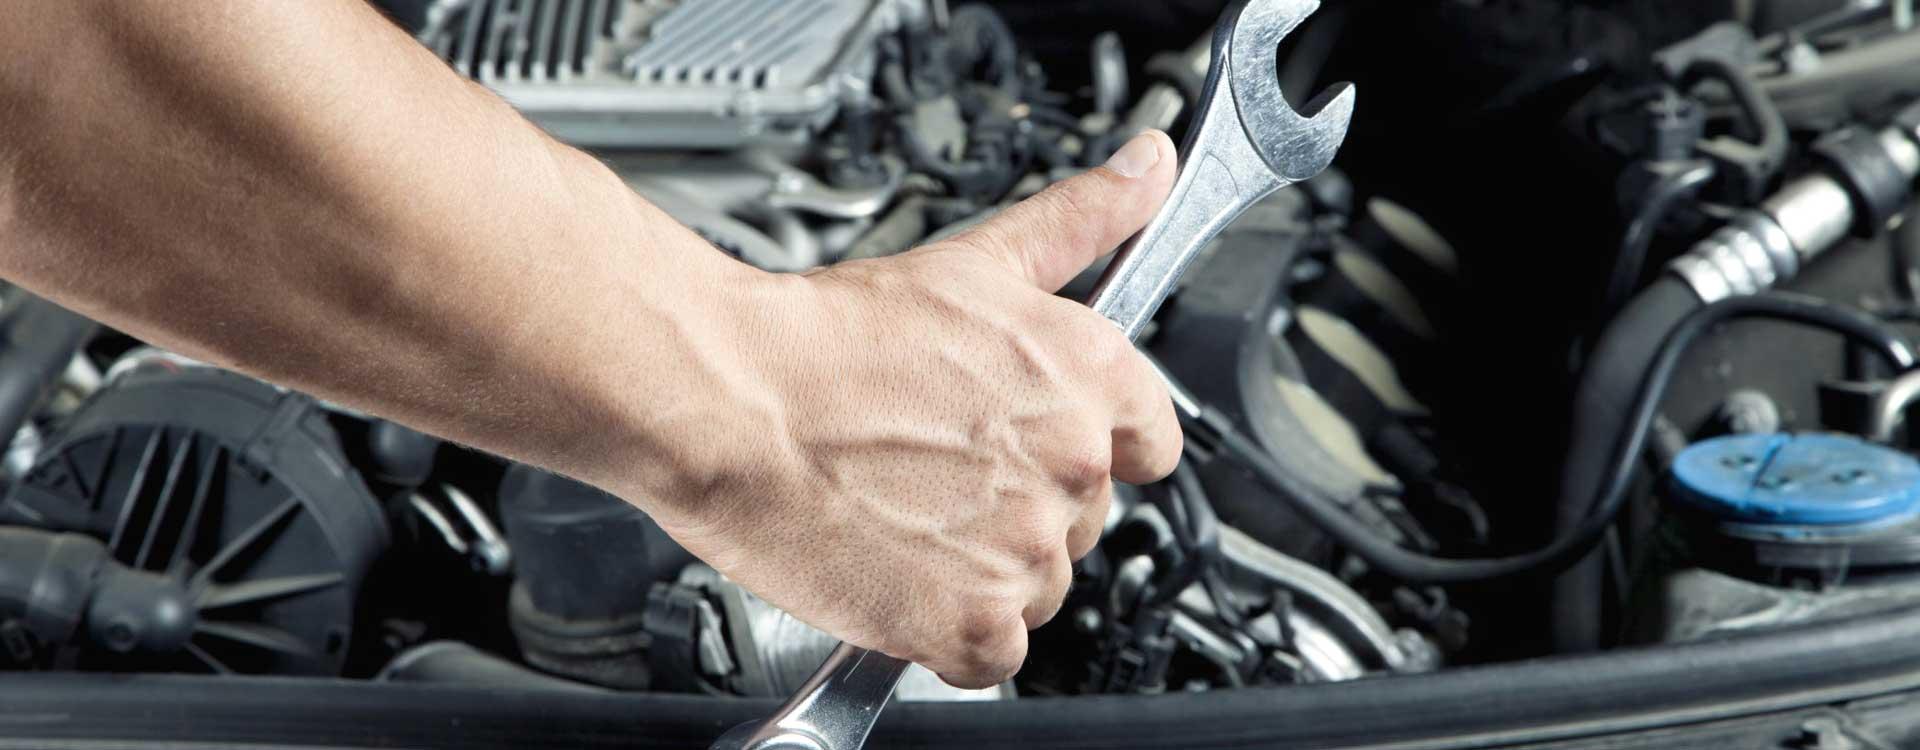 Mechanical repairs Braybrook